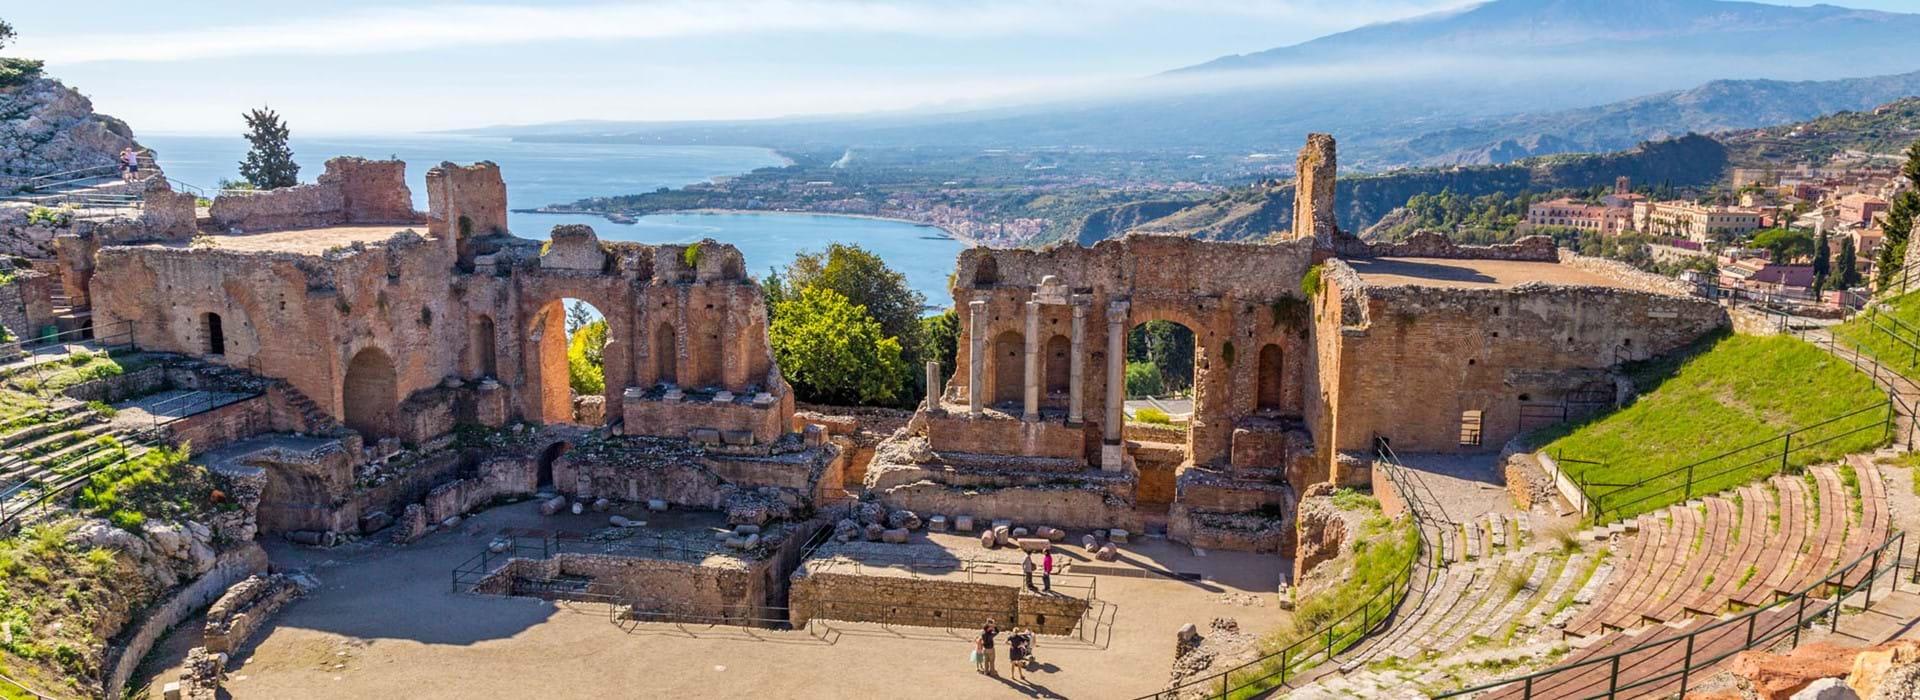 Etna, Taormina & Classic Sicily | Radio Times Travel